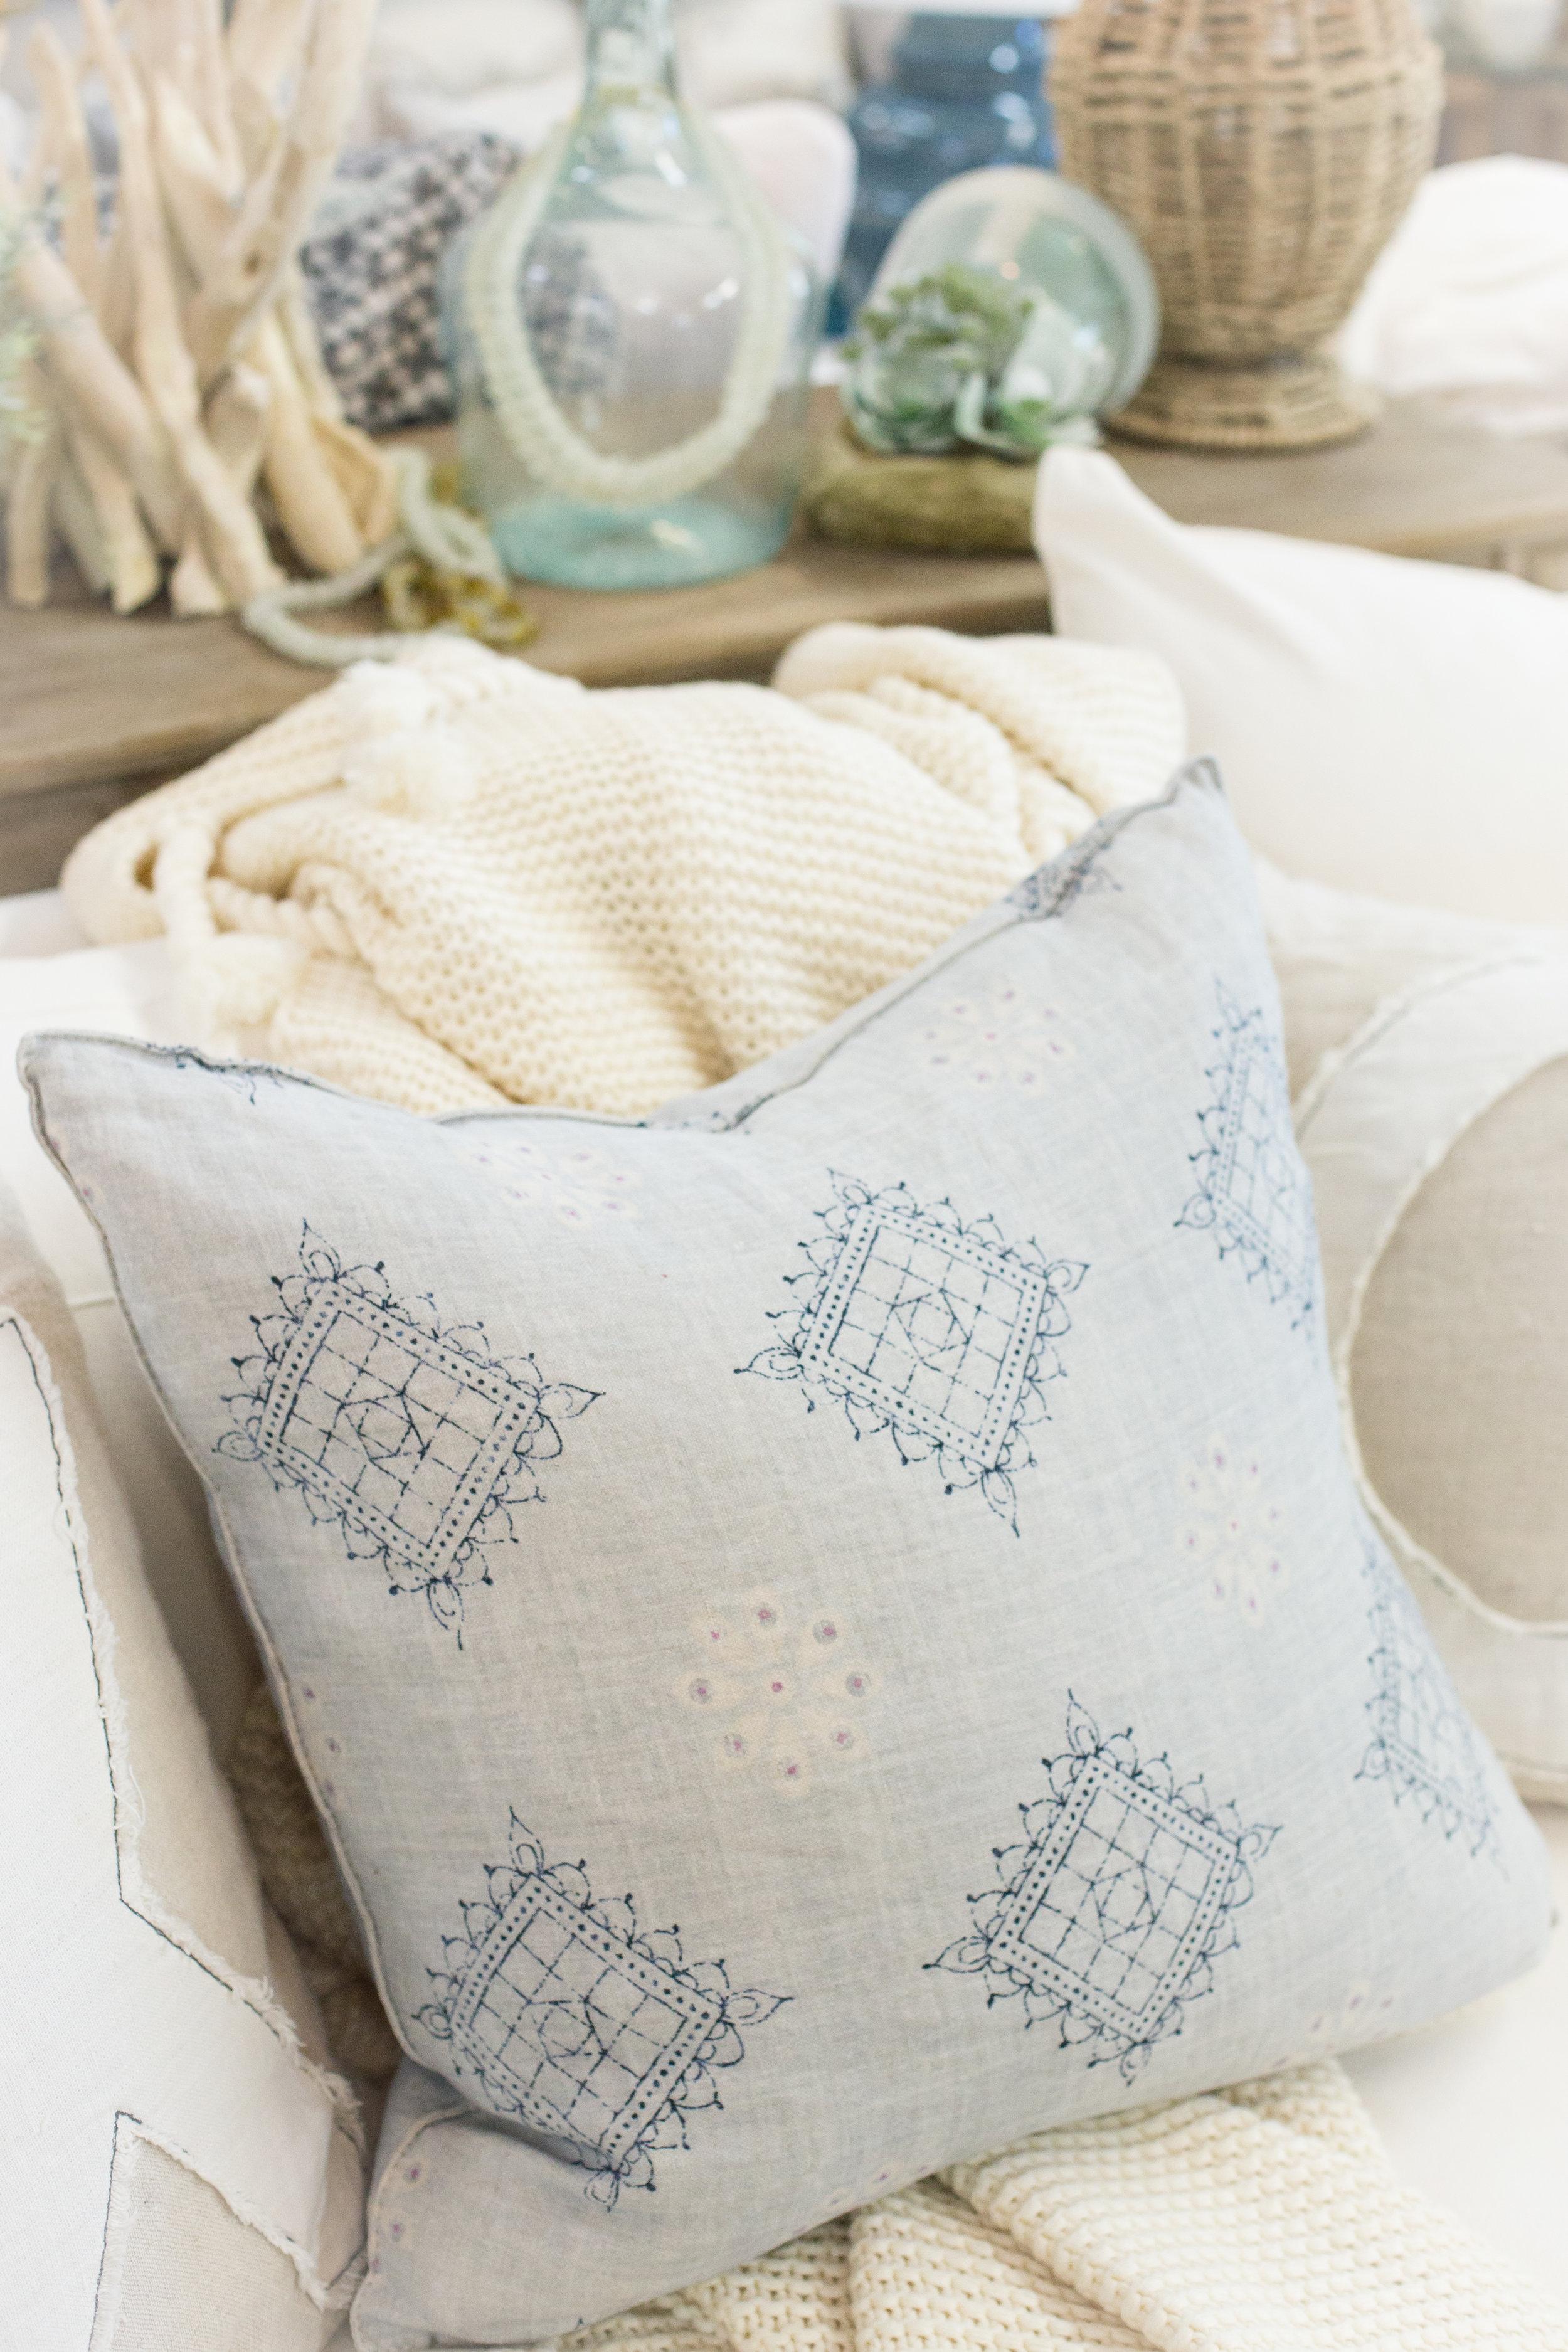 Ocean blue patterned pillow